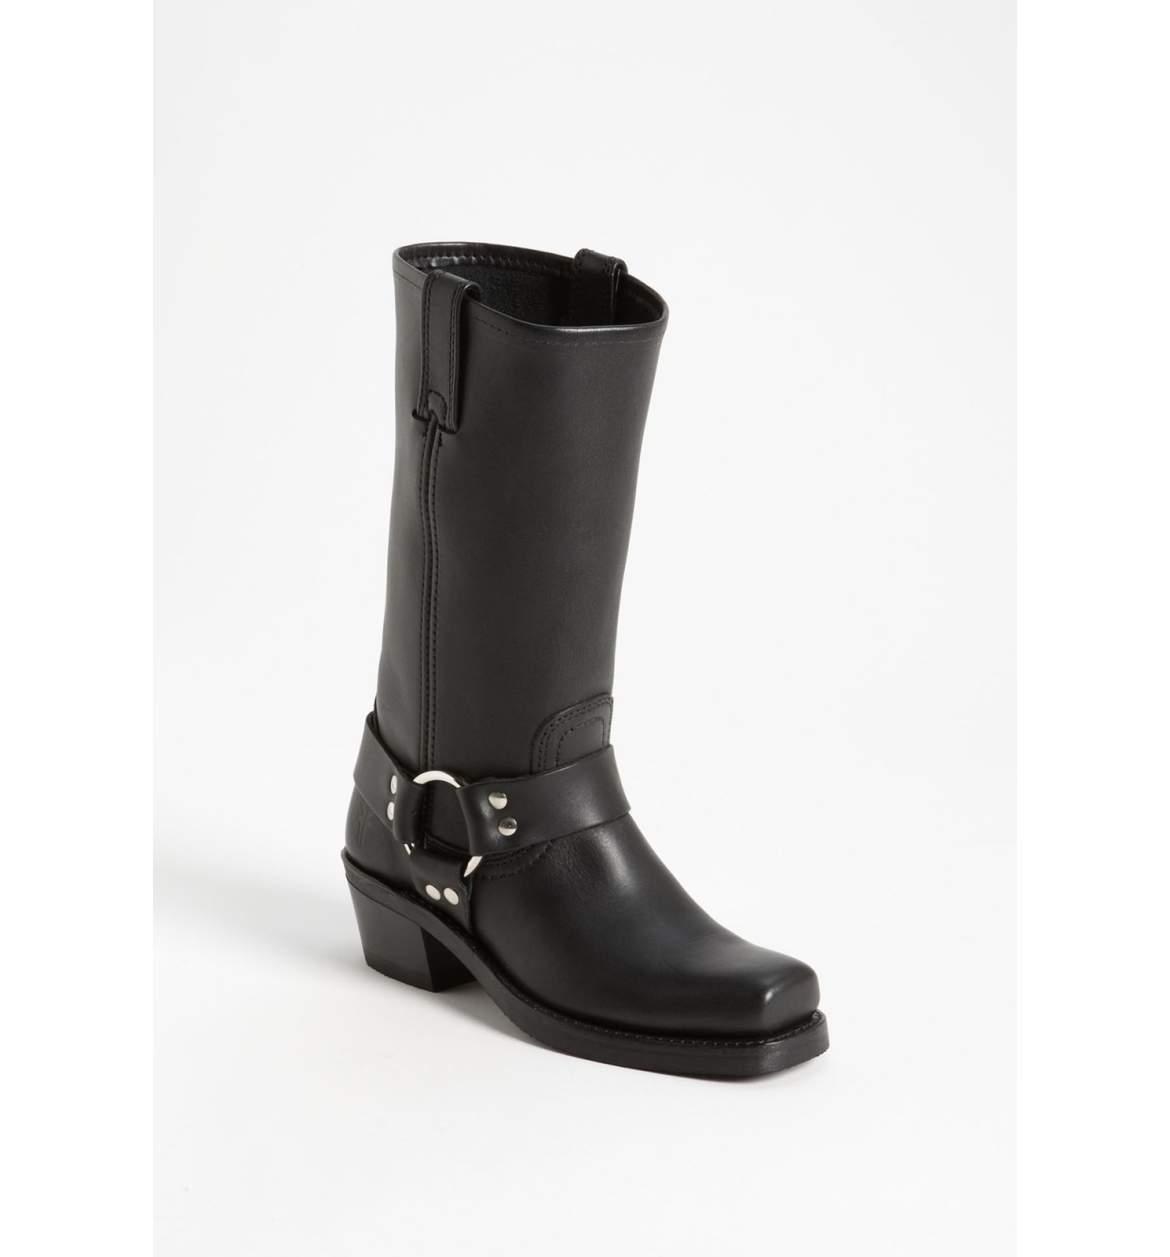 New sz 6 Frye Harness 12R Nero Nero Nero Pelle Tall Low Heel Stivali Shoes 3d36dc